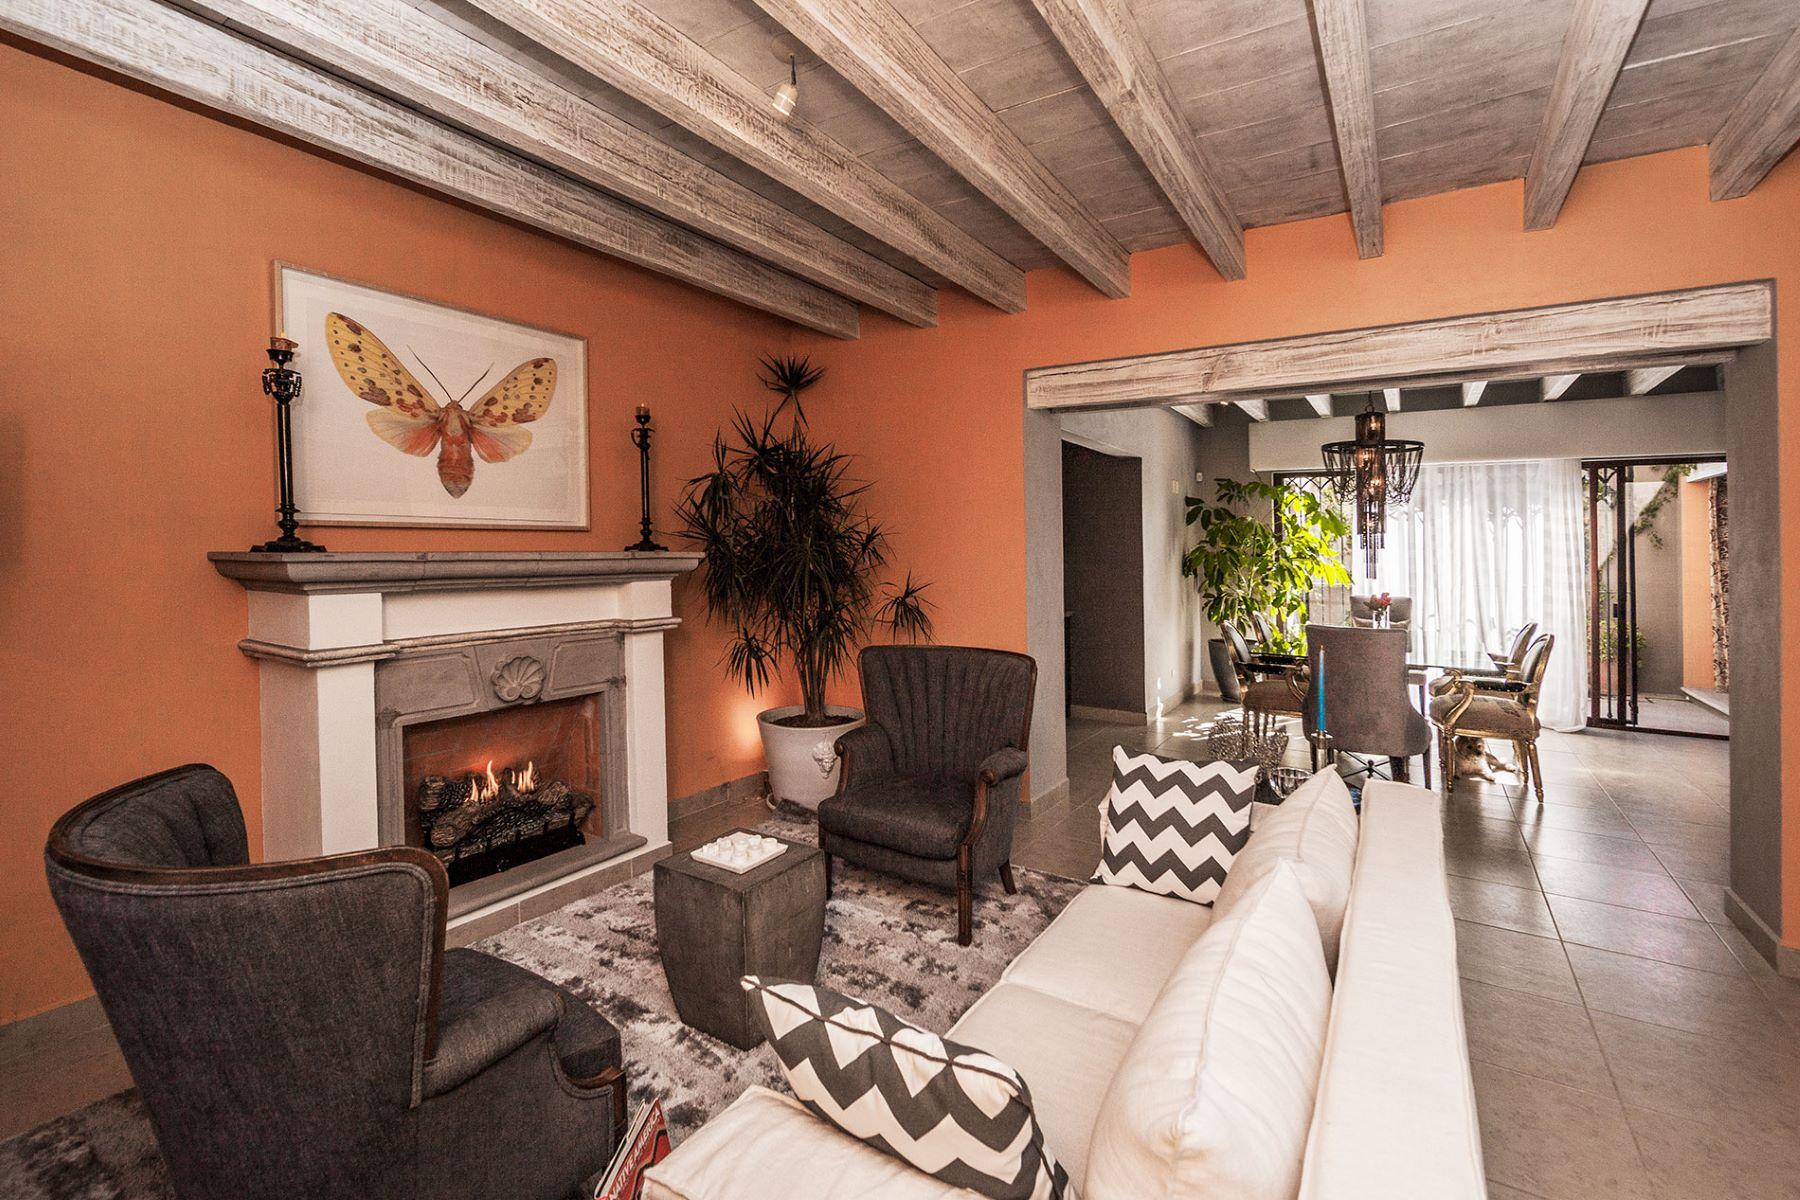 Single Family Home for Sale at Tormentosa Tormentosa 14 Paseo Real San Miguel De Allende, Guanajuato 37700 Mexico